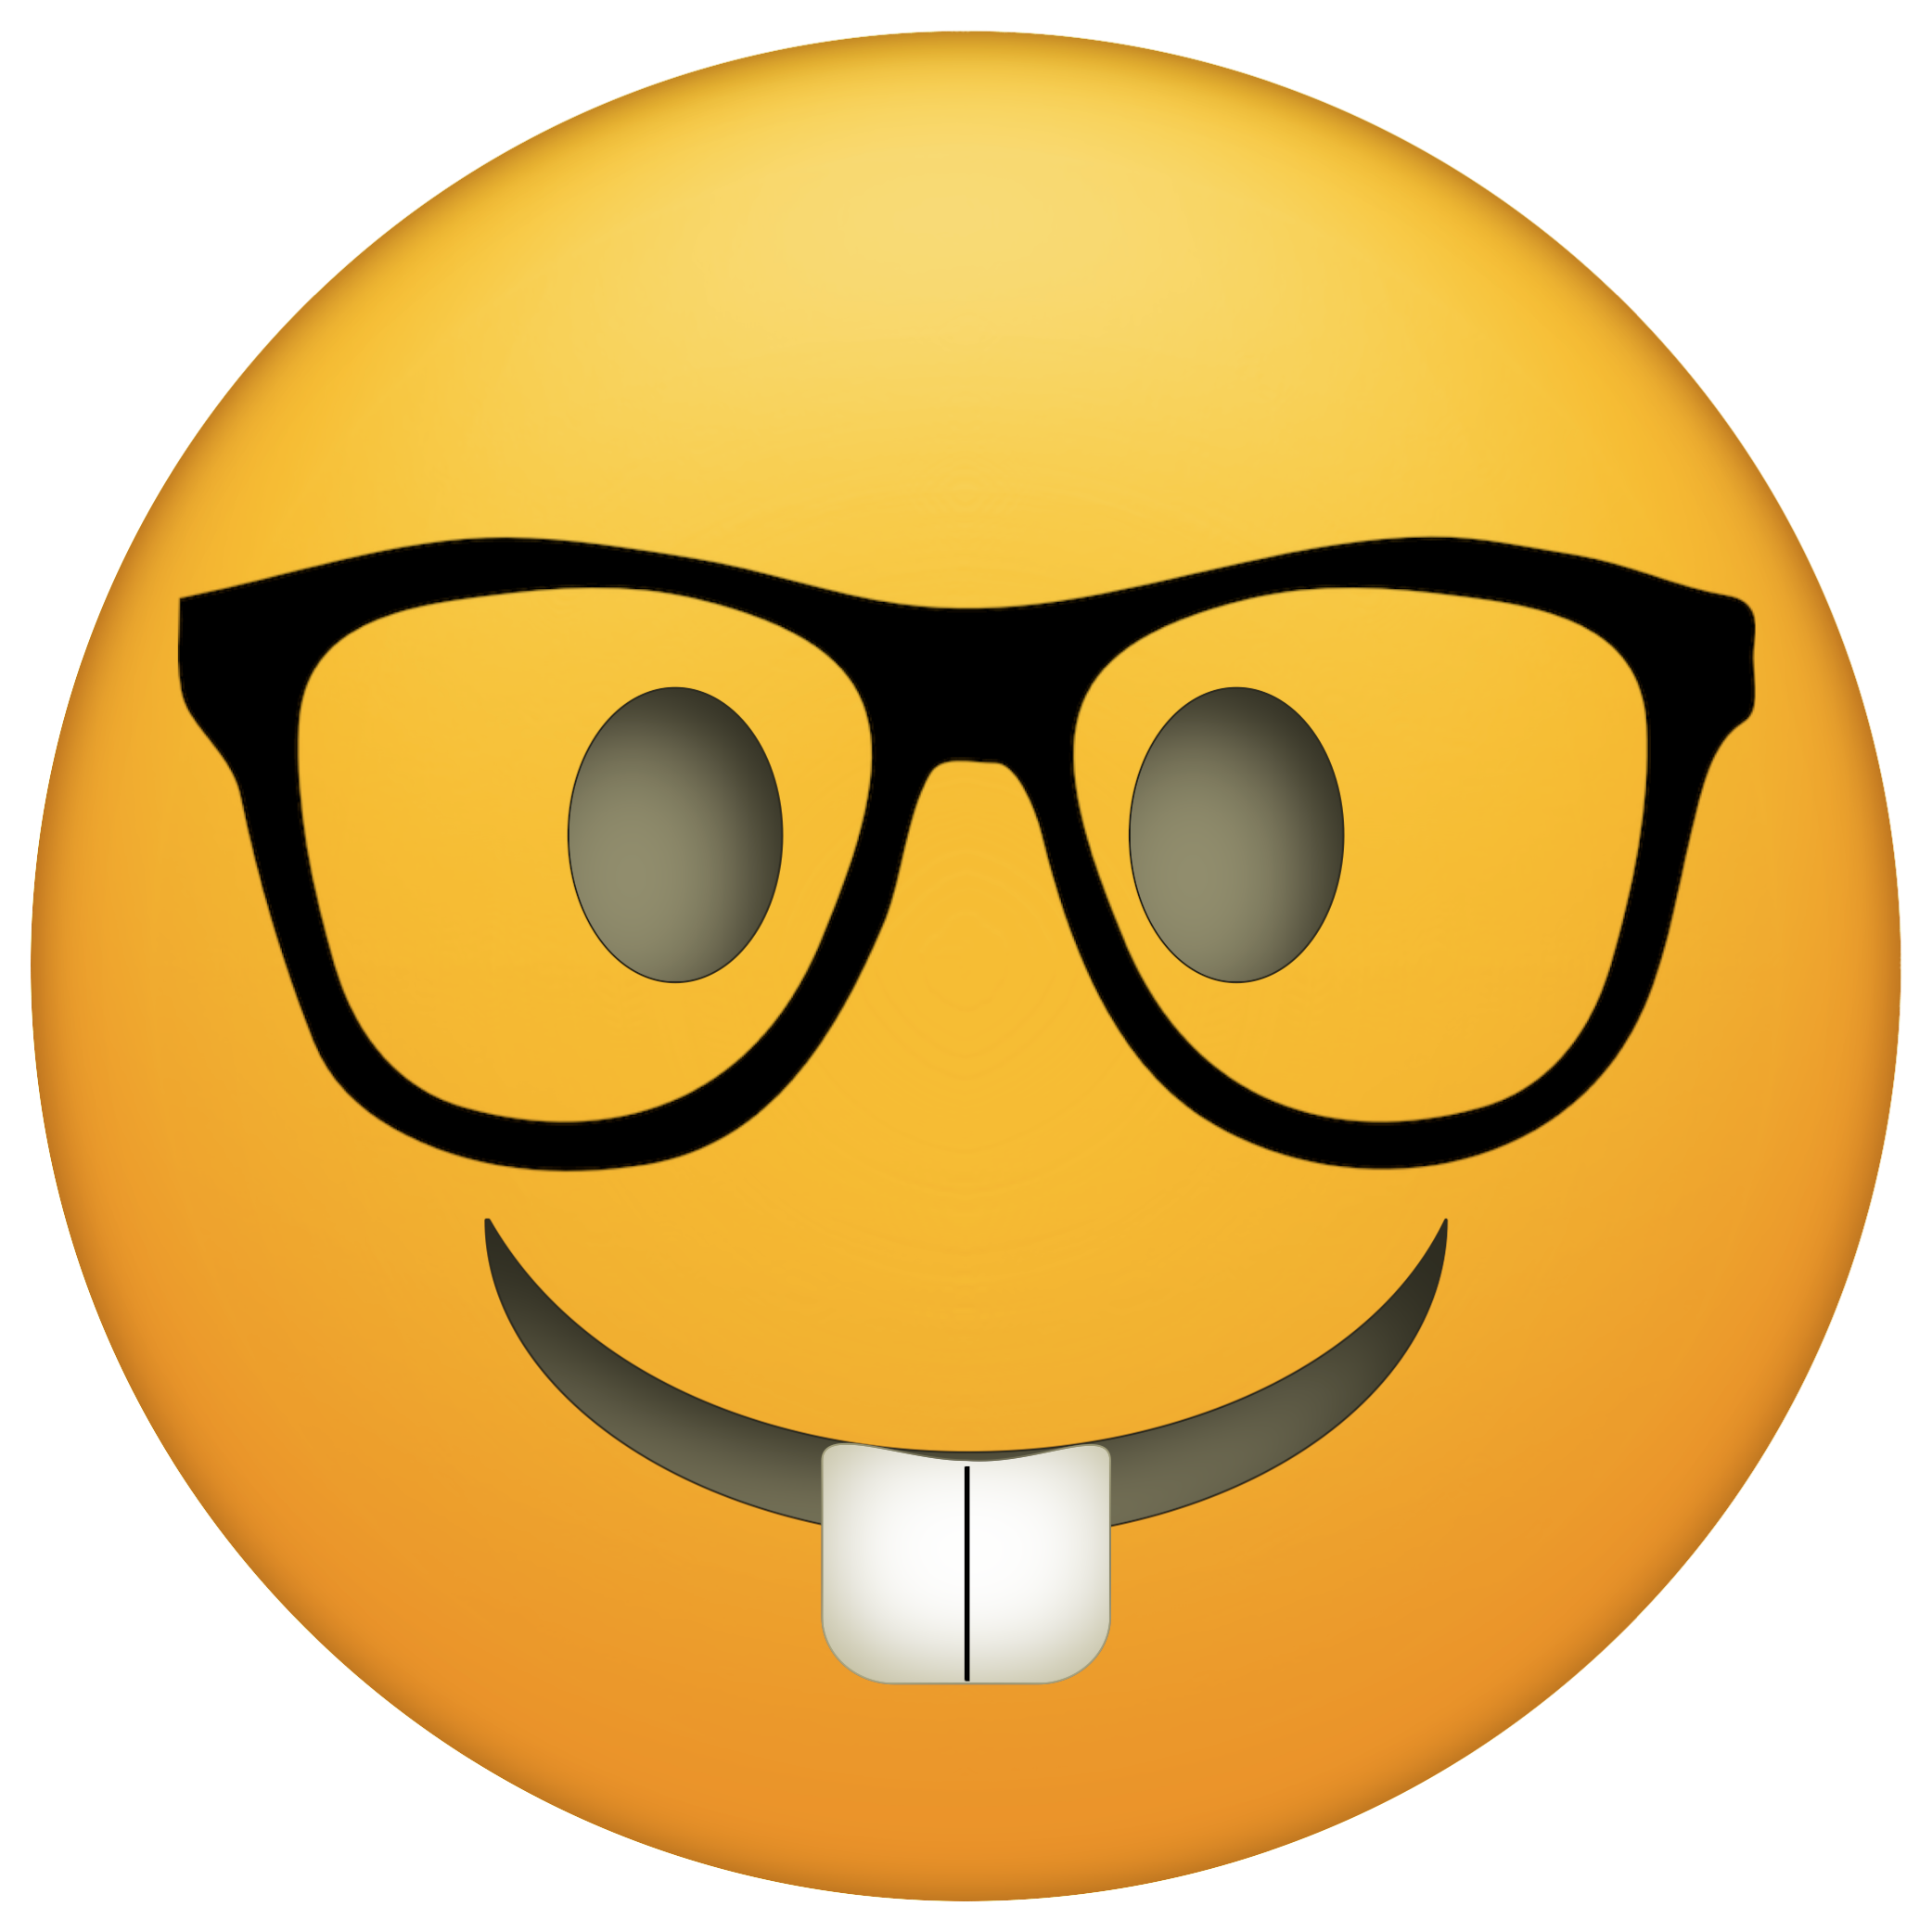 www.papertraildesign.com wp-content uploads 2017 06 emoji-nerd-glasses